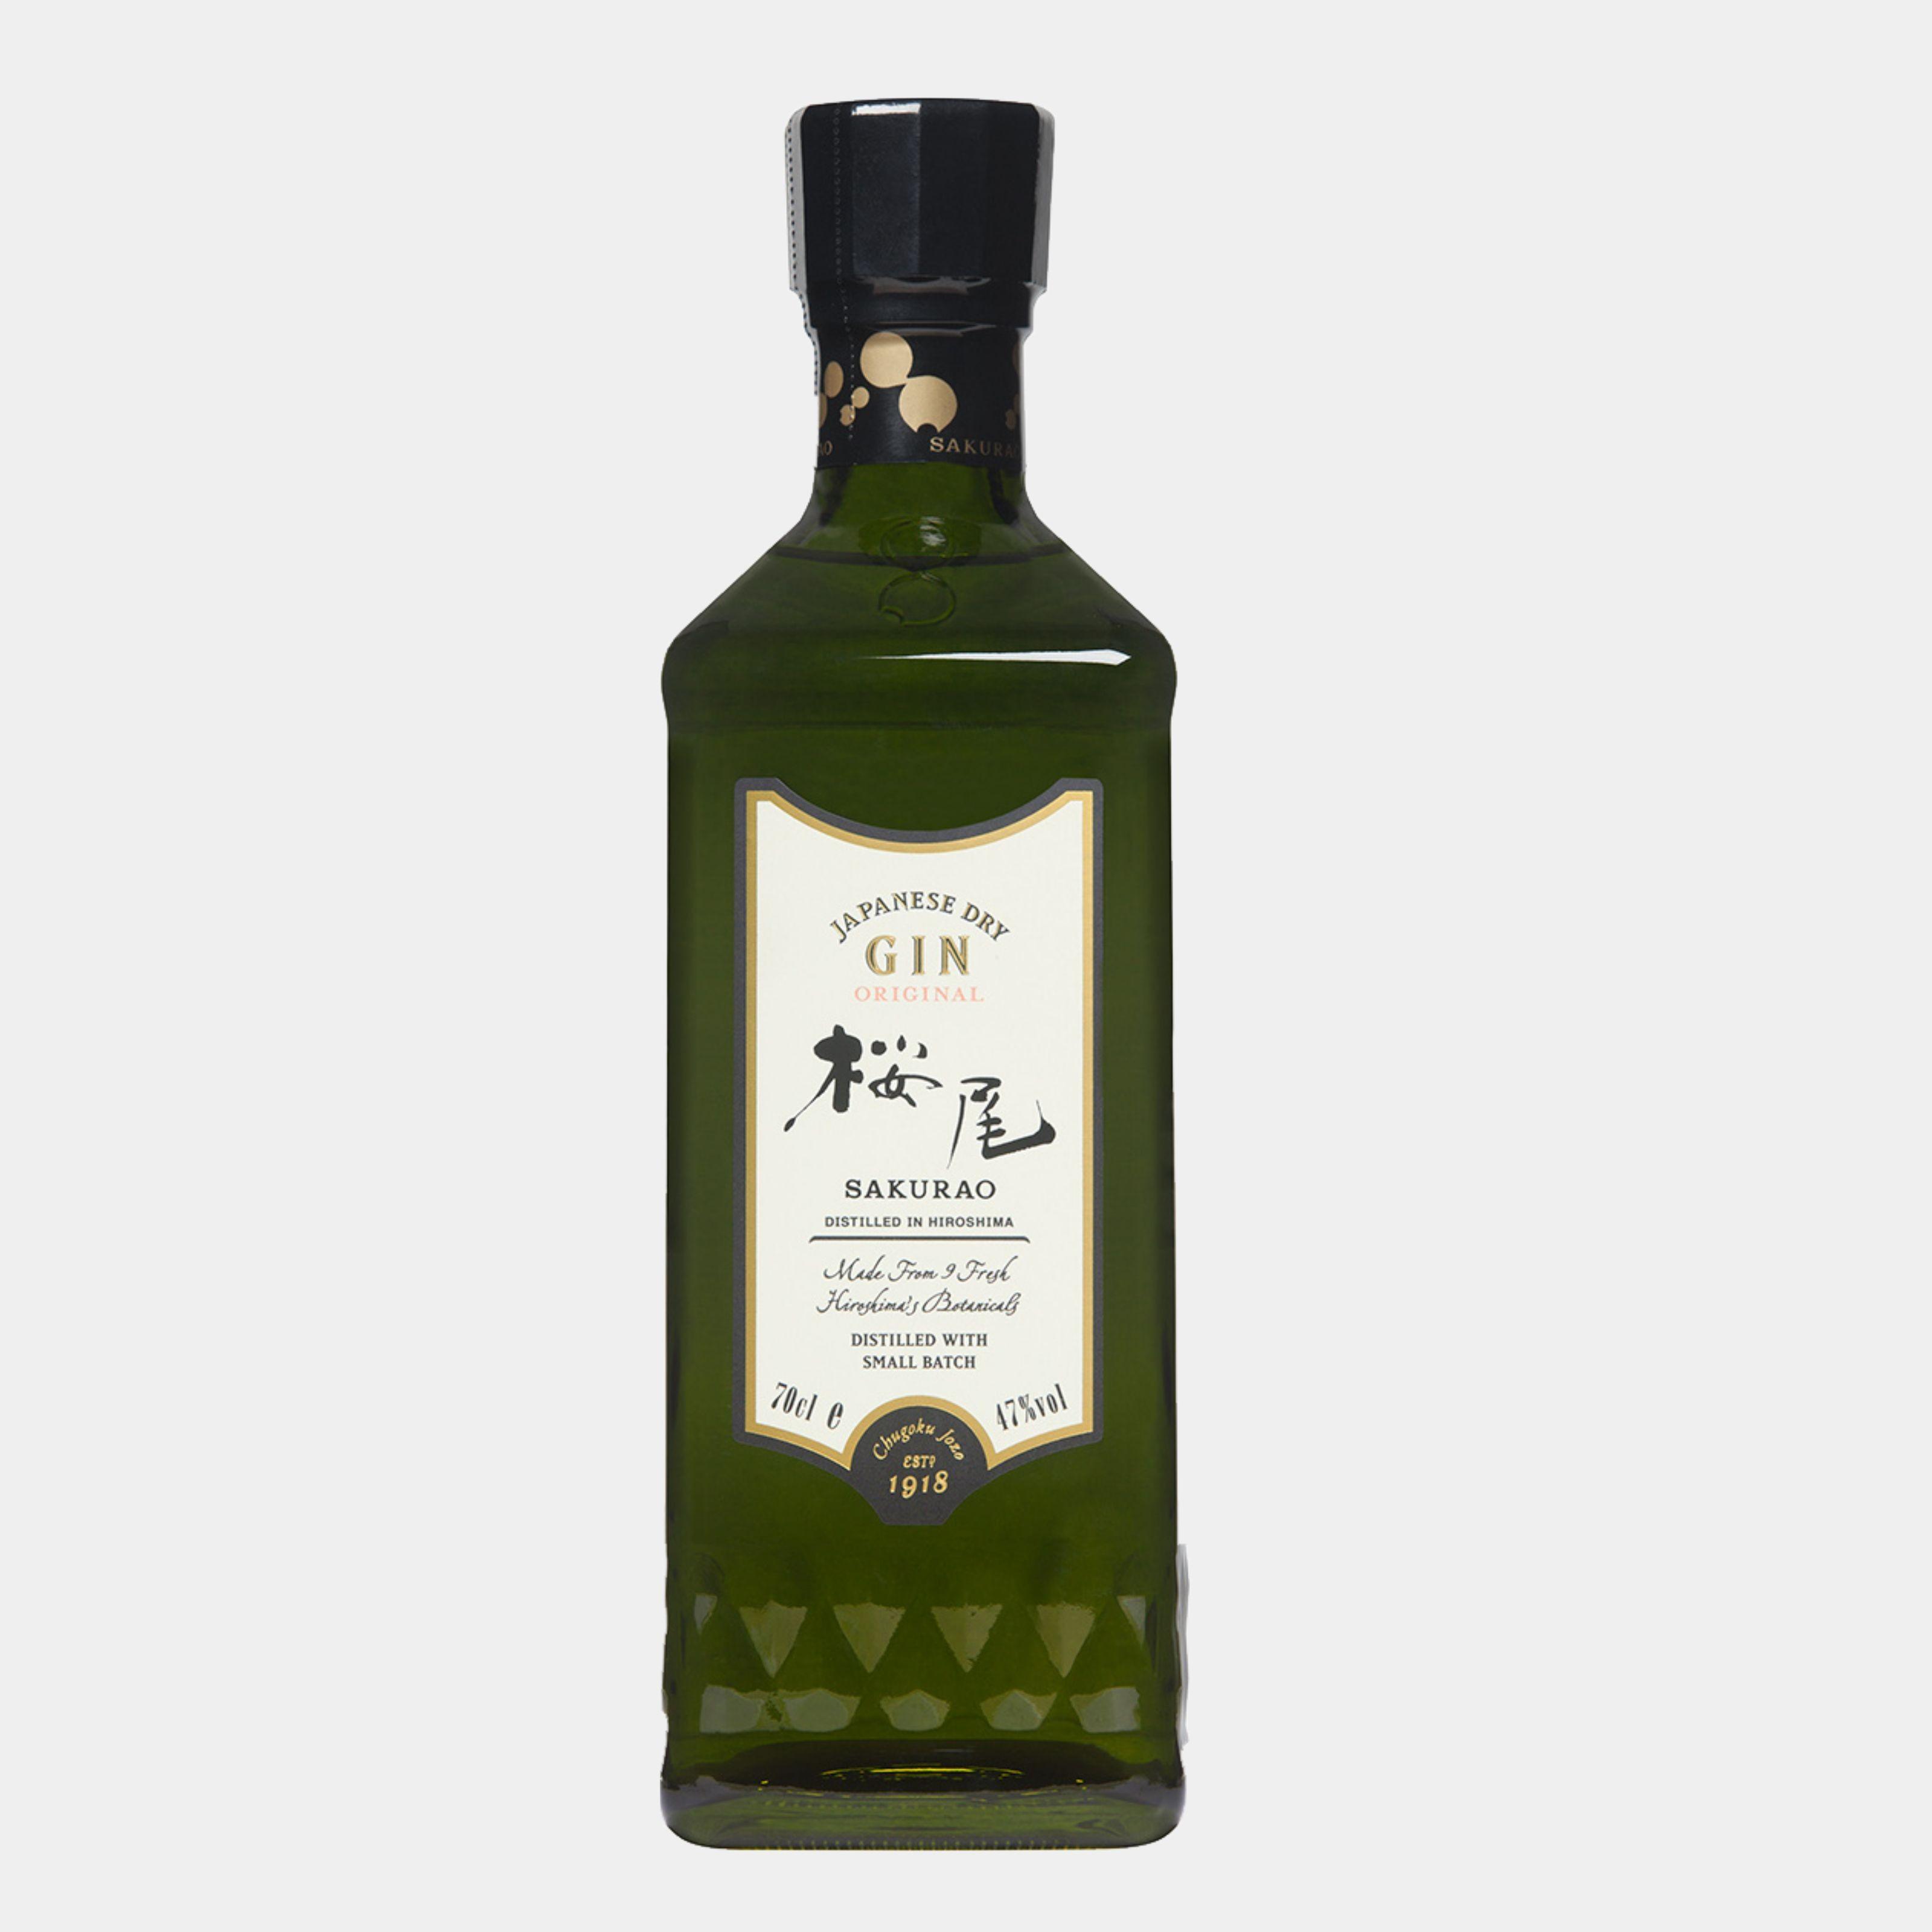 Sakurao Gin Original 0.7l 47% Alk.